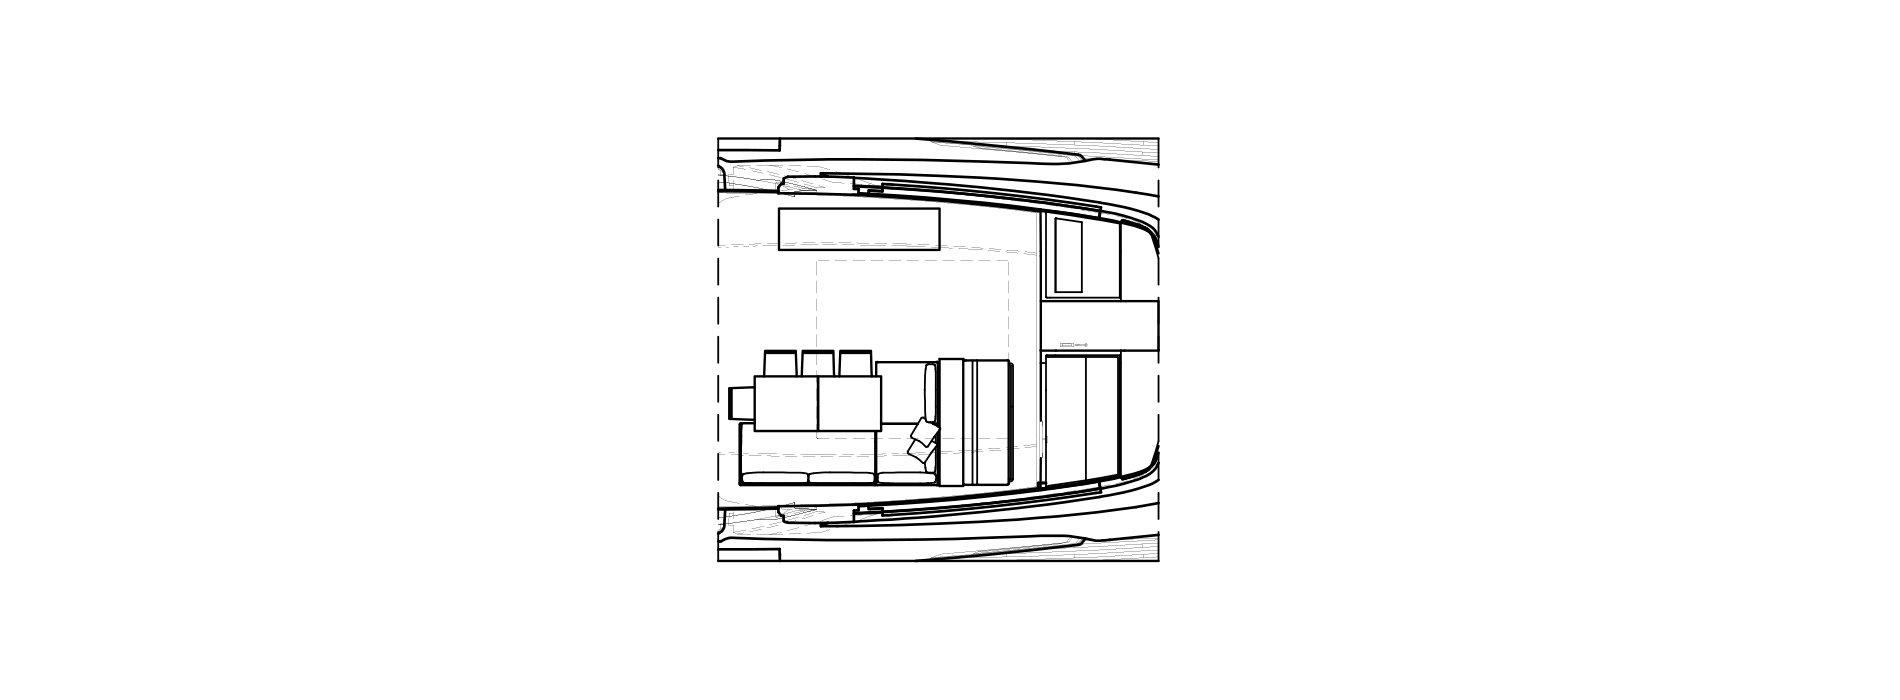 Sanlorenzo Yachts SX88 Detalles Versione B